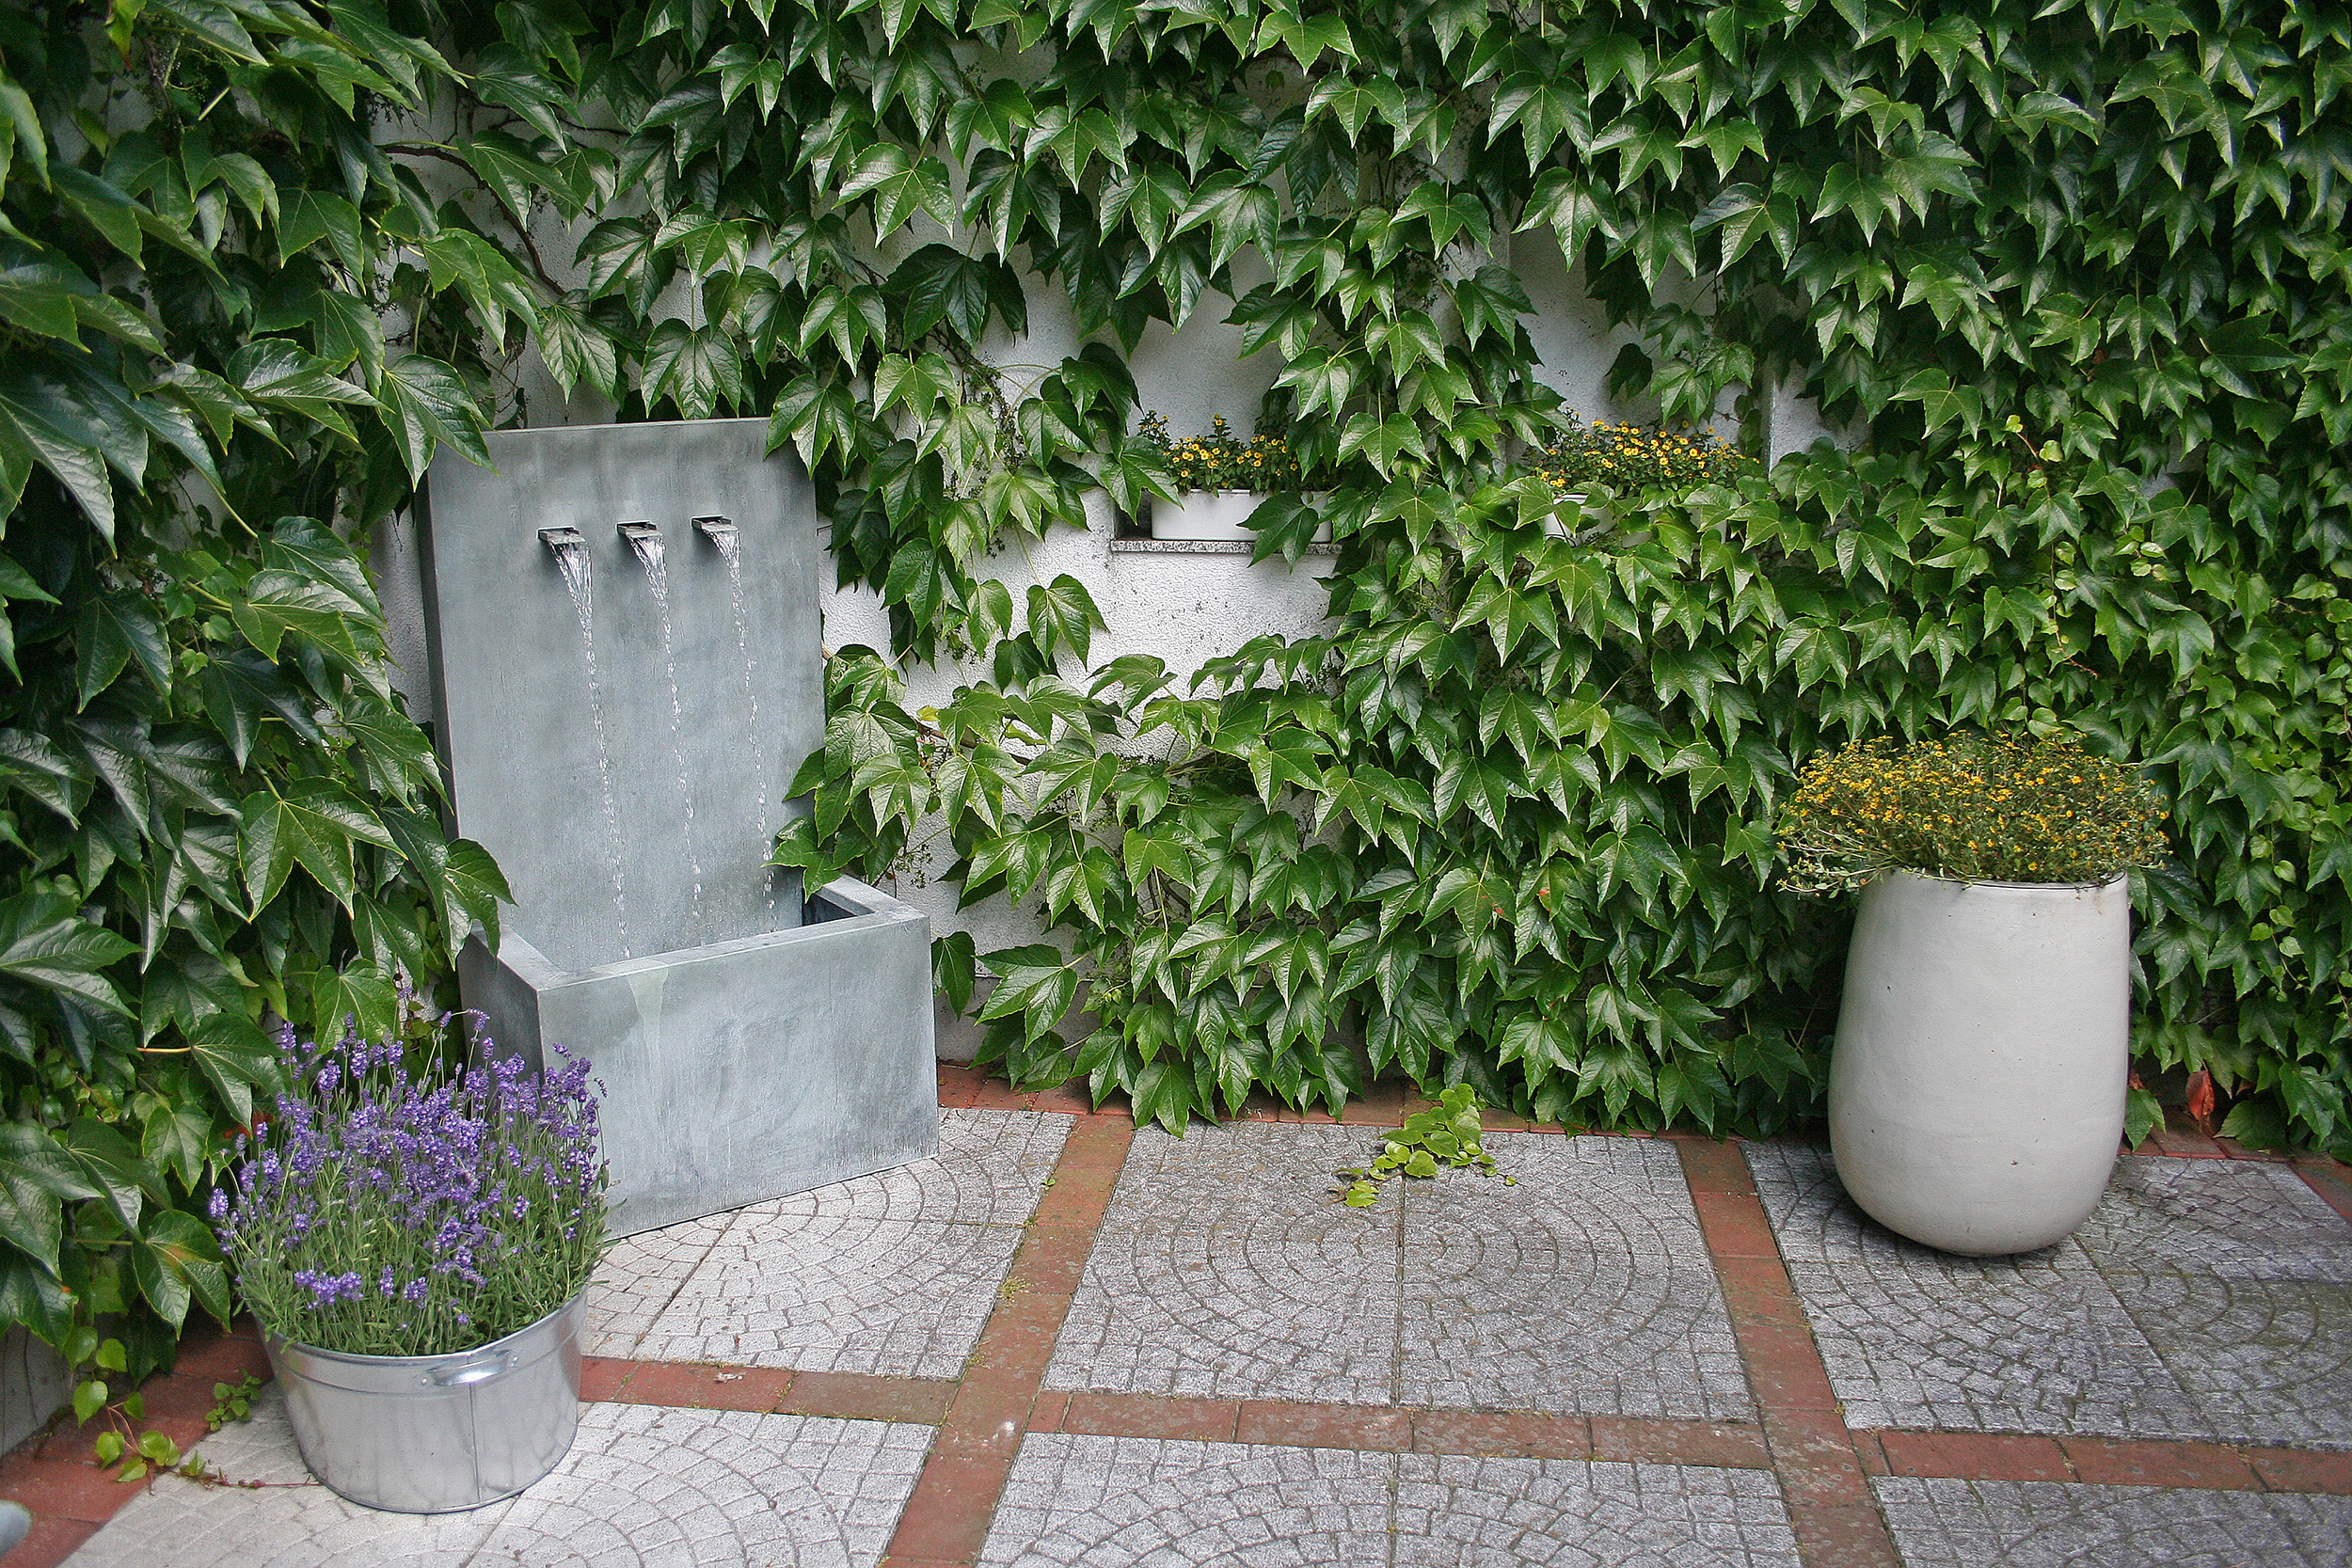 Wandbrunnen wasserfall wand zinkart wall 3 gardomat - Wand wasserfall ...